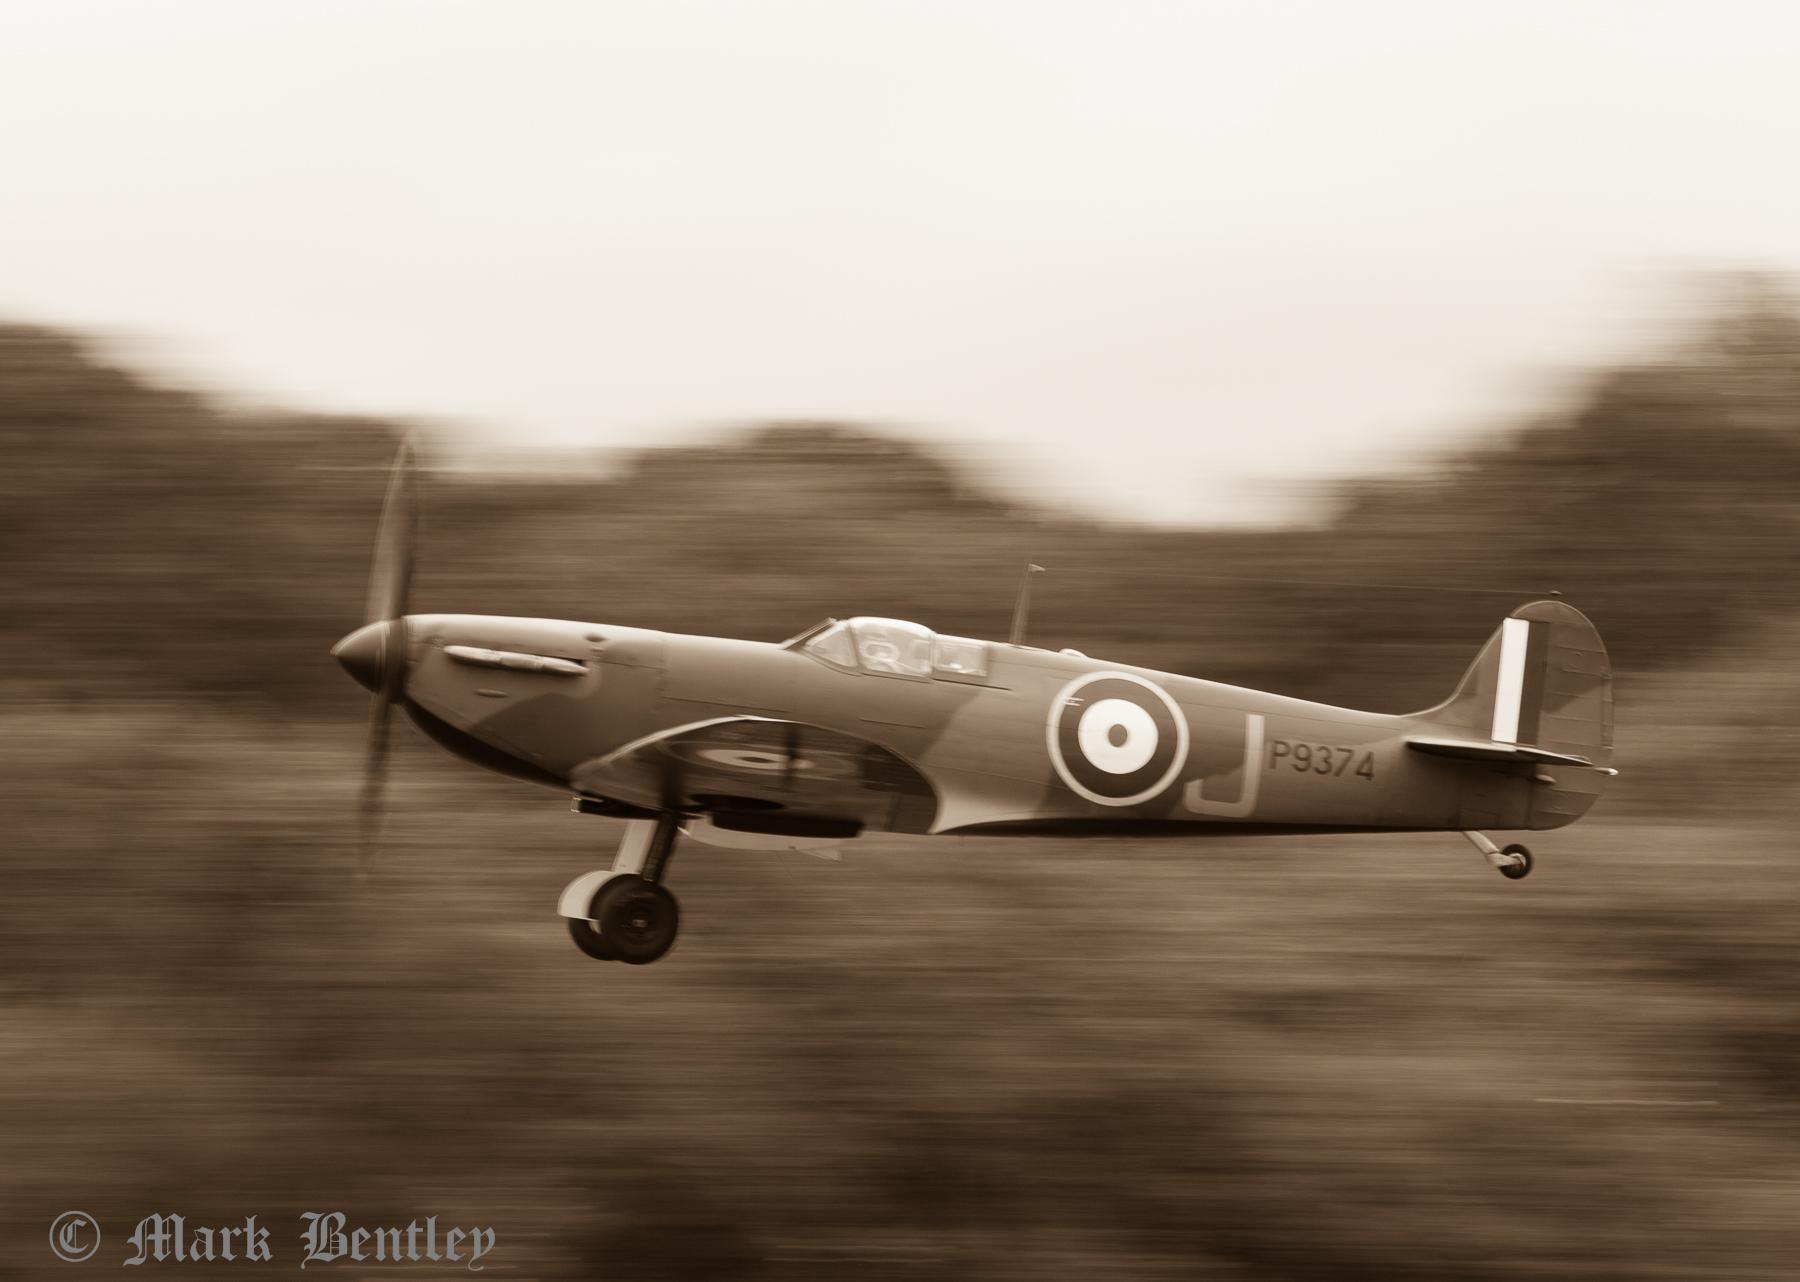 C018 Supermarine Spitfire